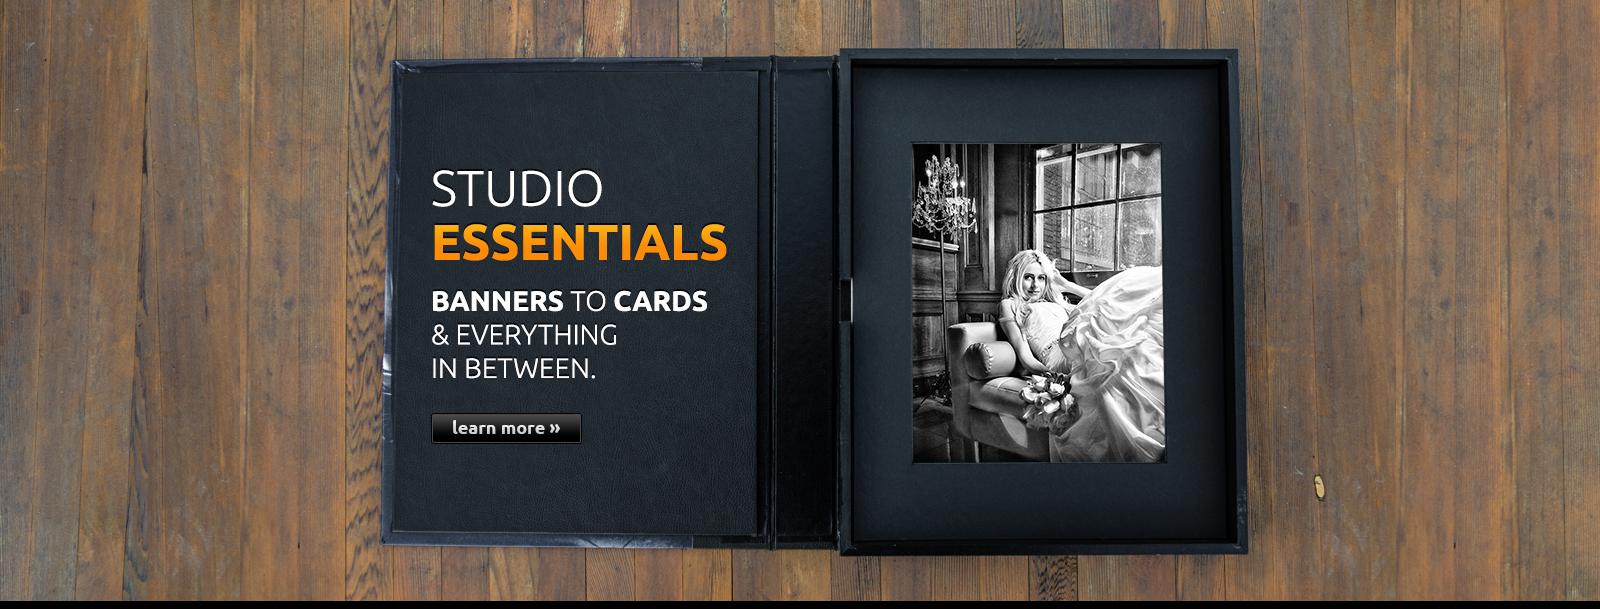 Phaloo_HomepageBanners_Studio